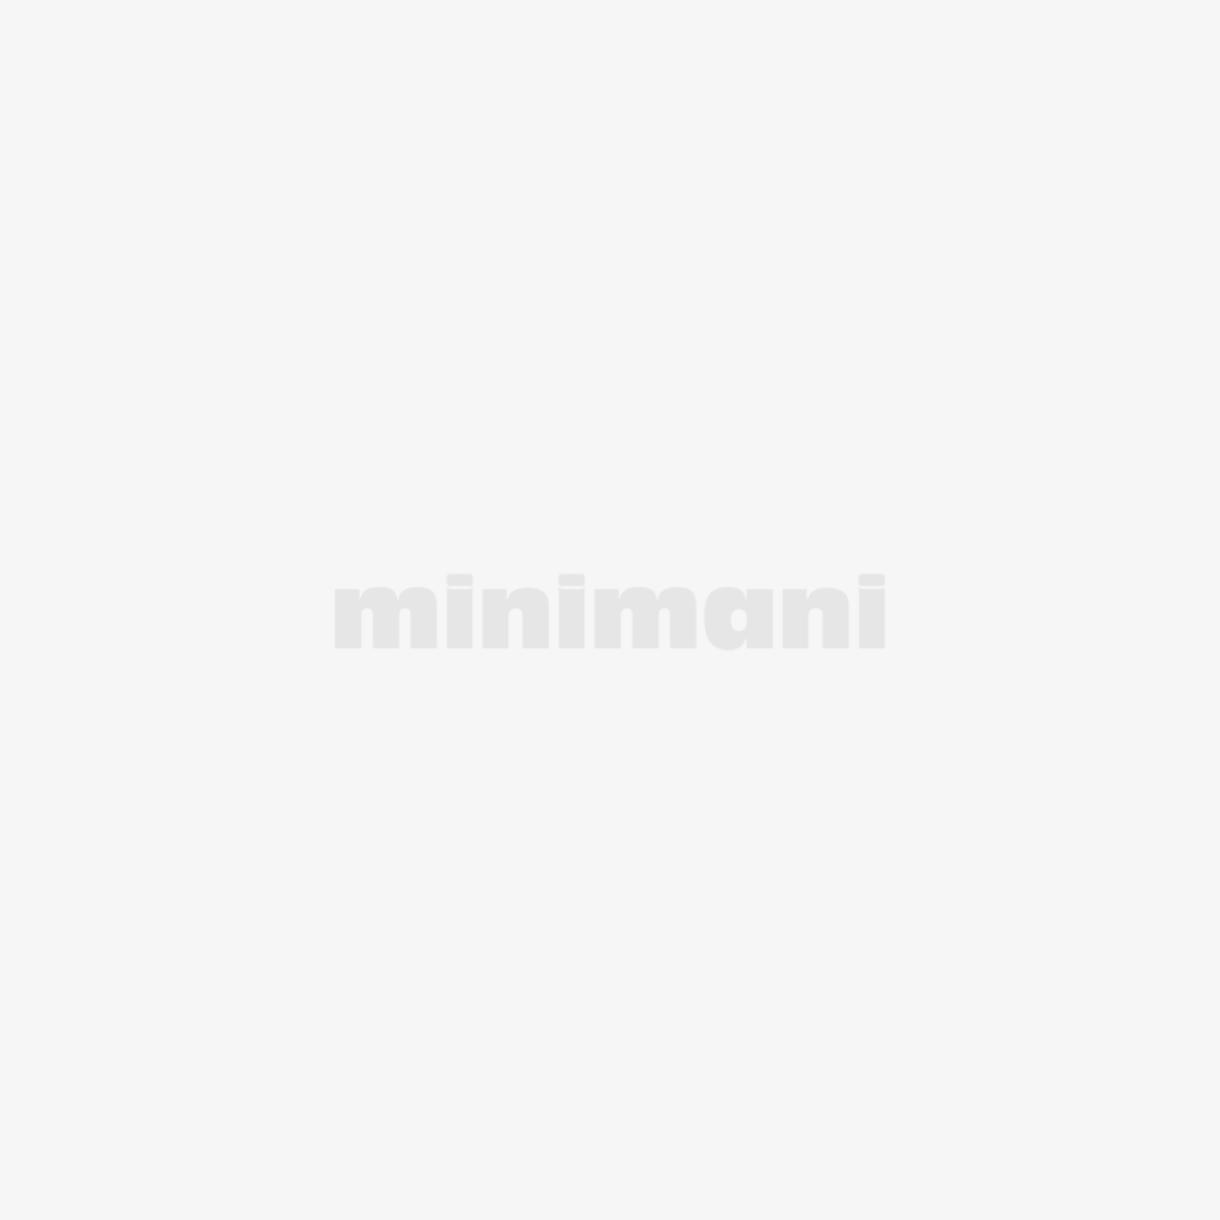 NATRIA HYÖNTEISTEN TORJUNTA-AINE, SPRAY 750 ML